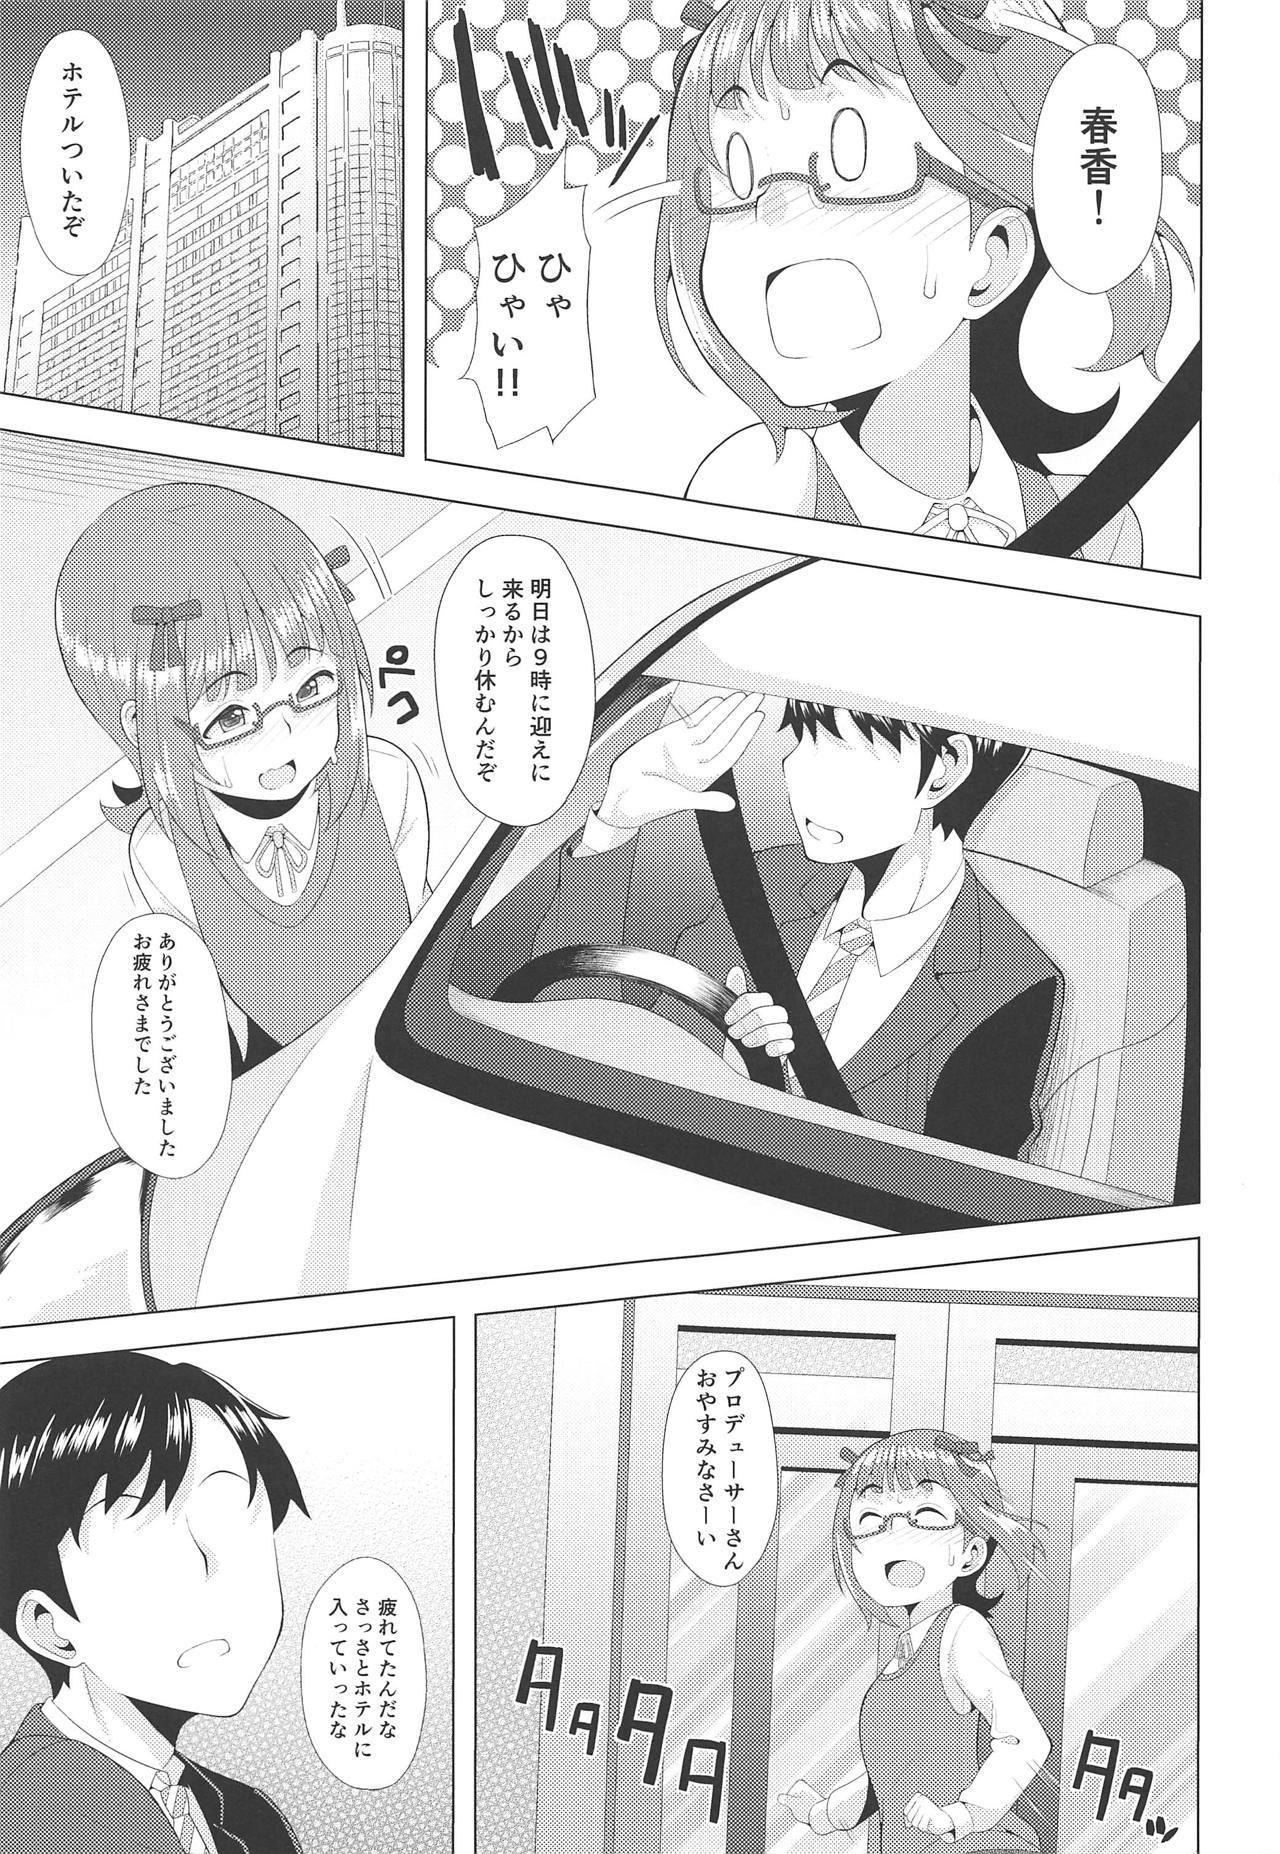 Ninki Idol no Renai Jijou 9